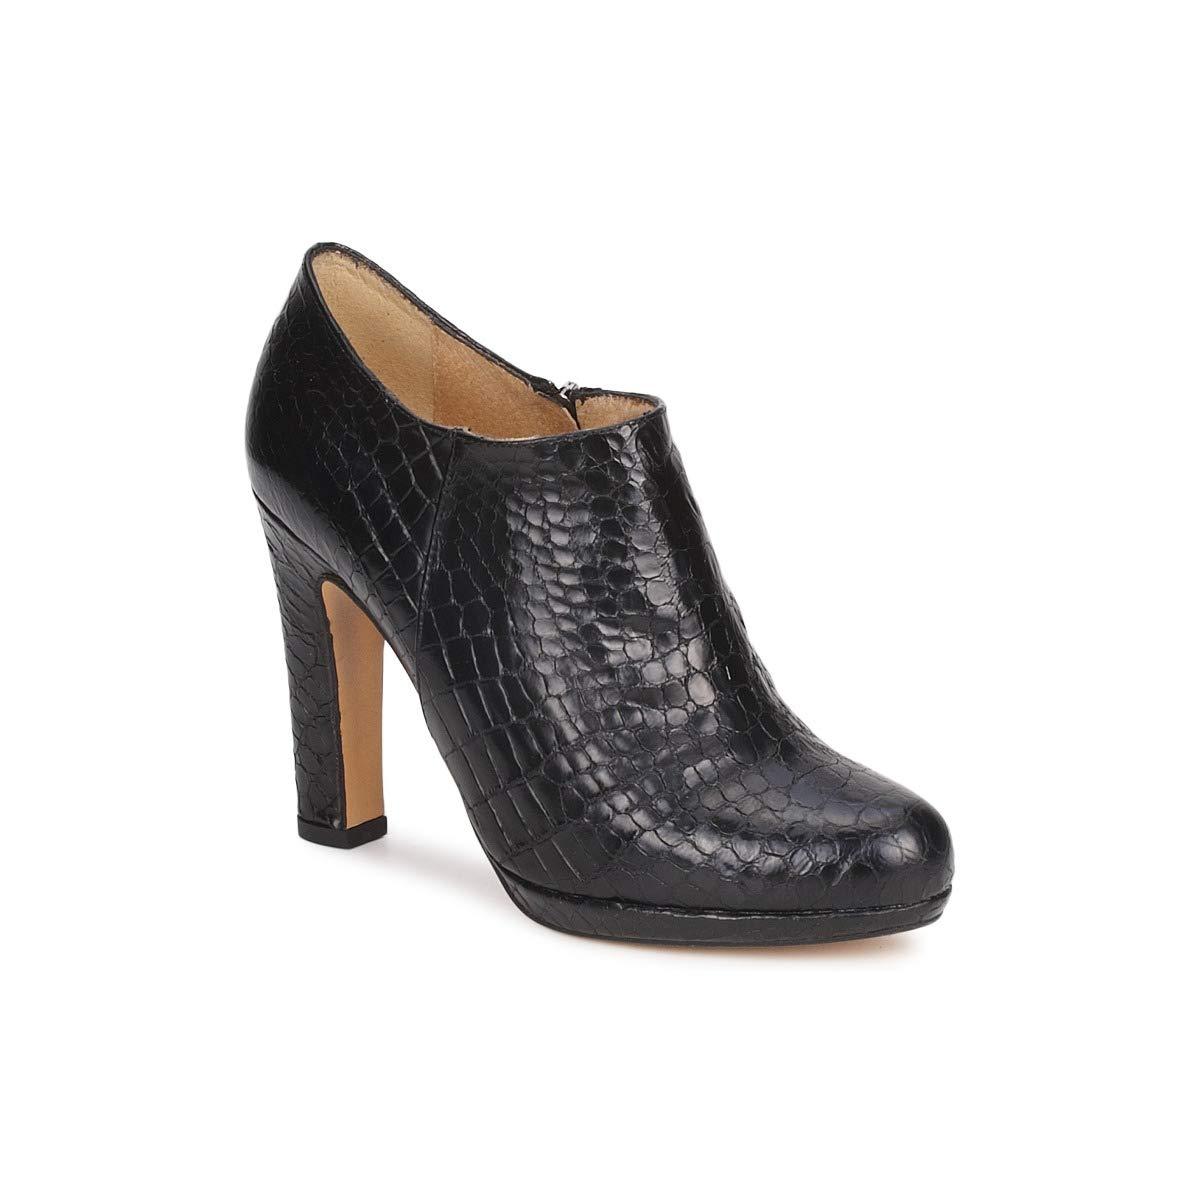 Fericelli OMBRETTA Stiefelletten Stiefel Stiefel Stiefel Damen Schwarz Ankle Stiefel 6eba18